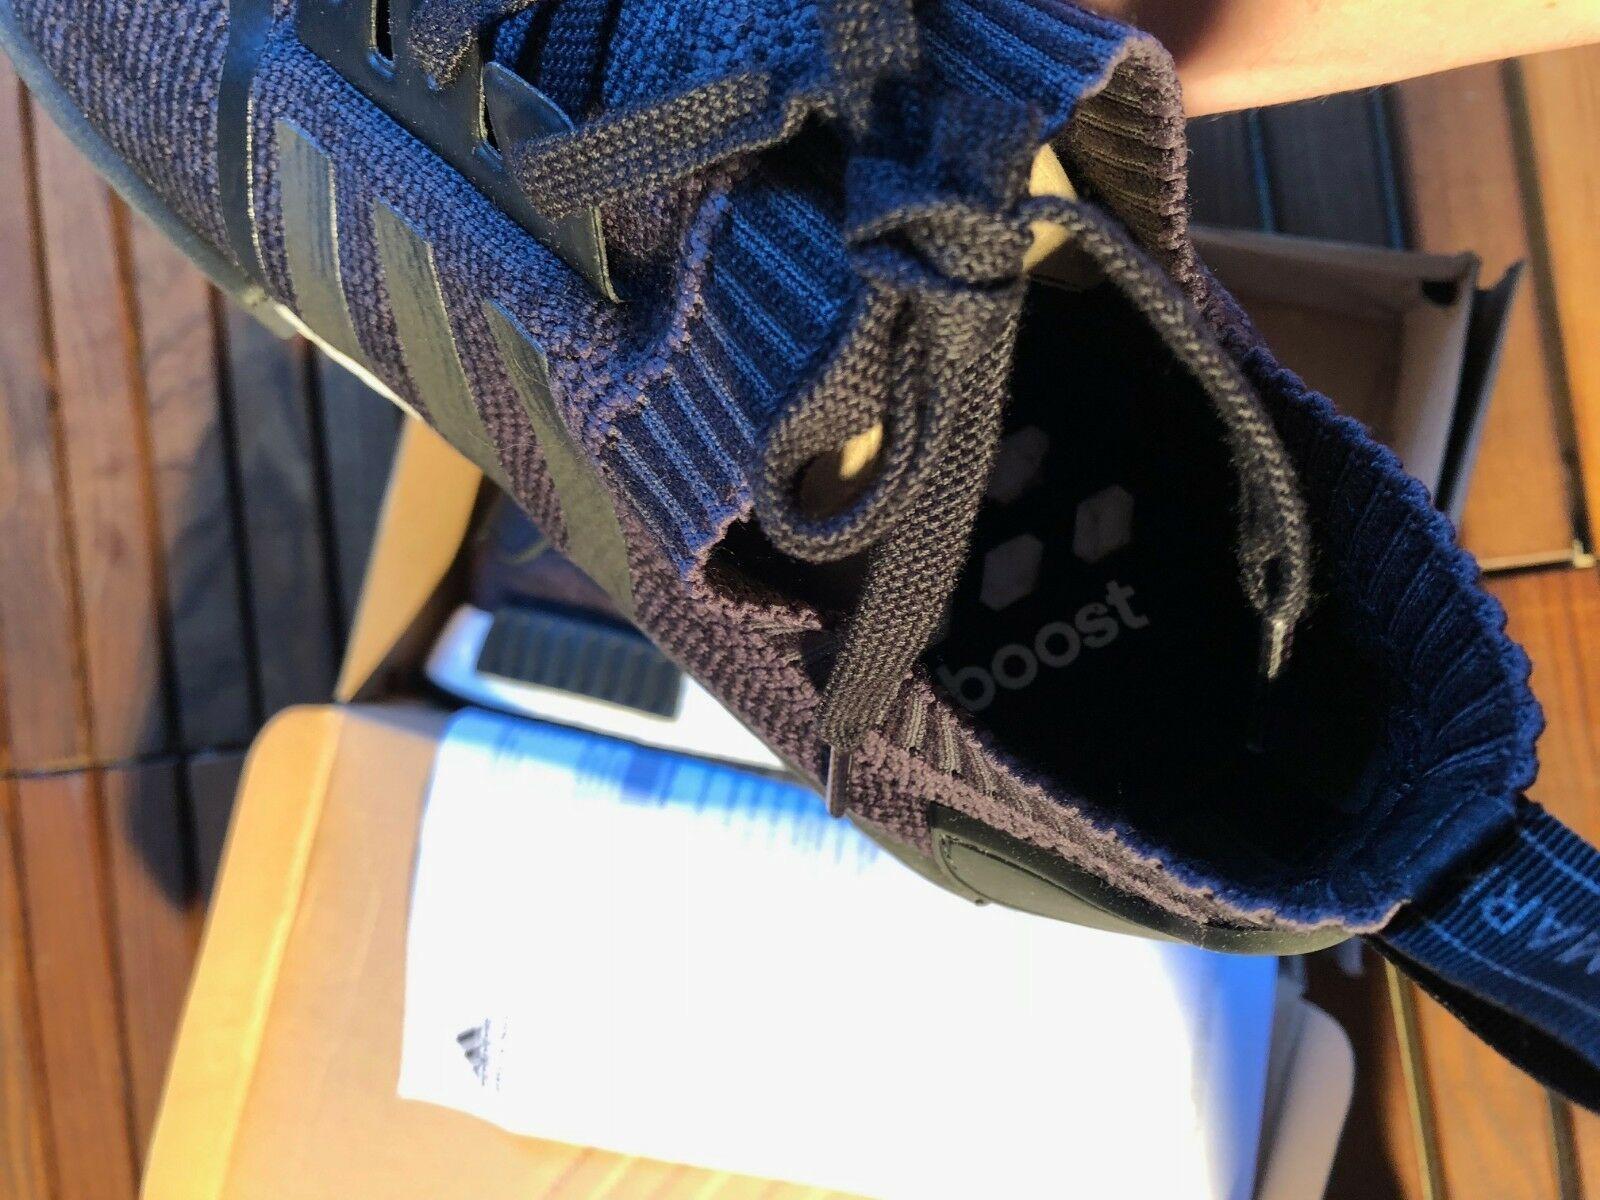 Adidas Black Primeknit Wool Runner Size 48 2/3 New image 6